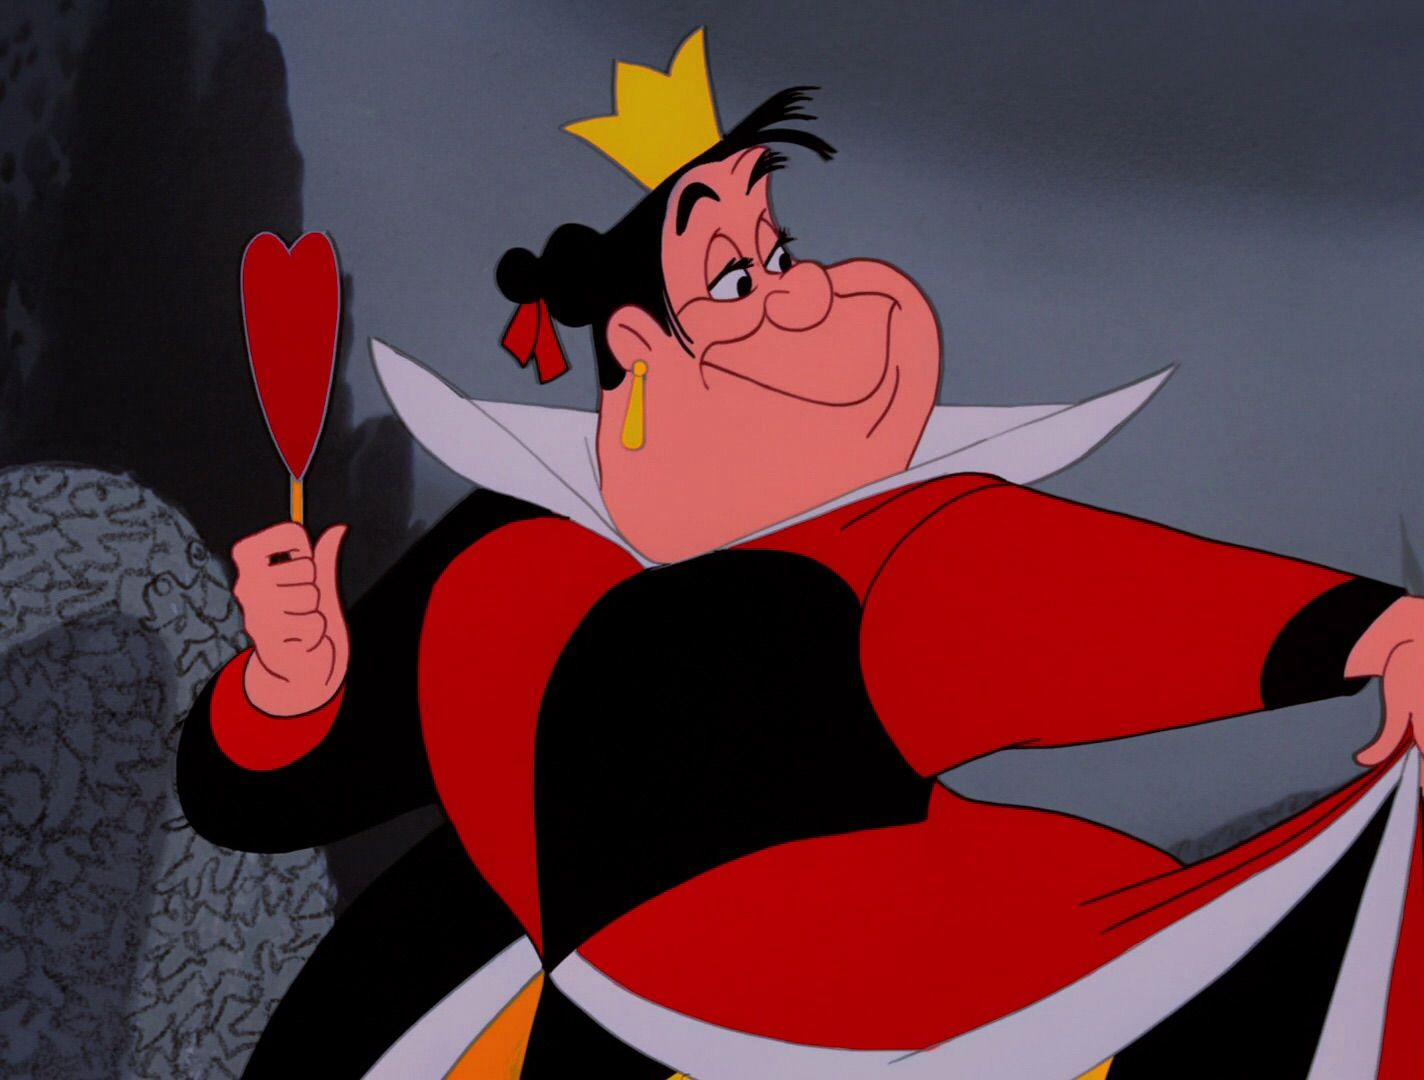 Risultati immagini per regina di cuori alice | Cattivi di disney ...